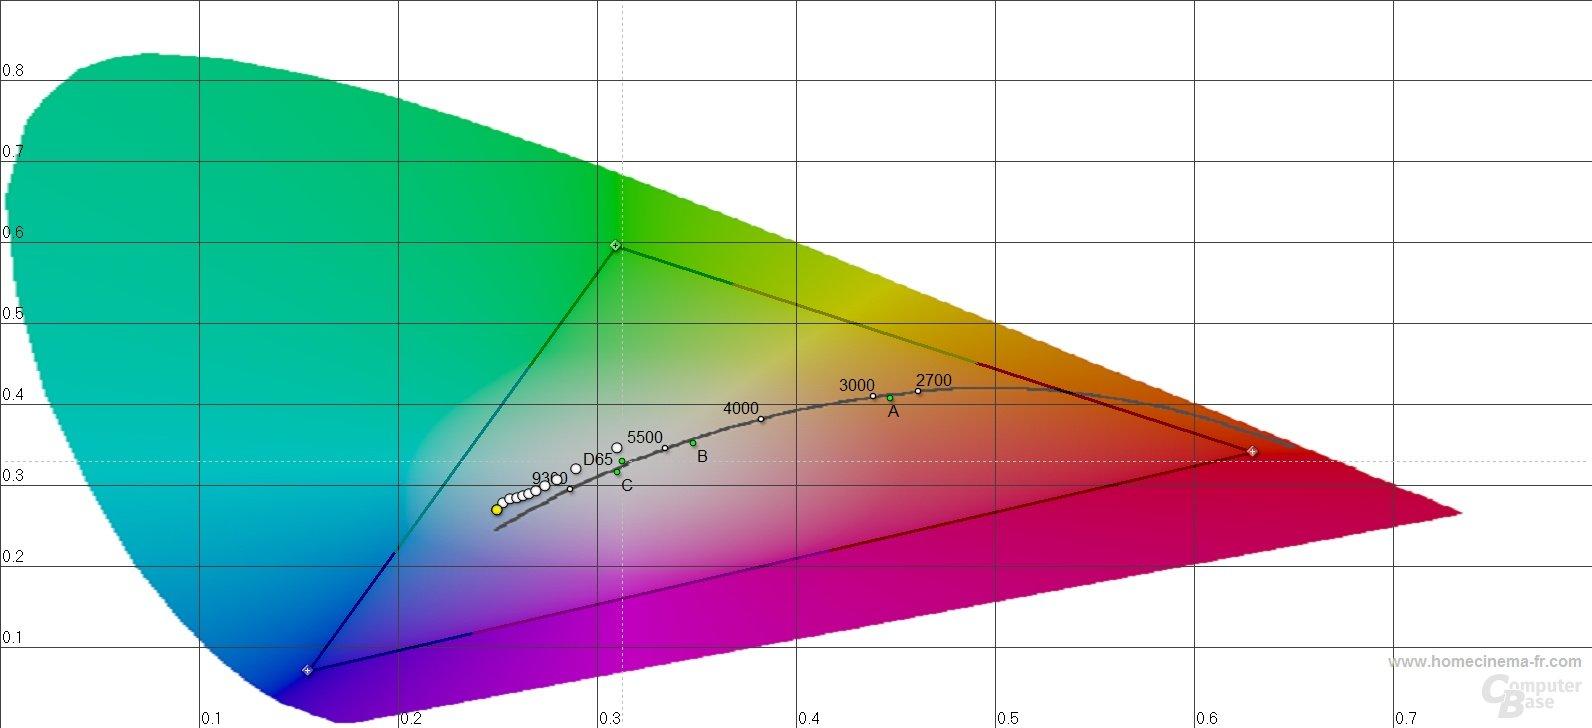 Asus Zenbook UX31E: Farbtemperaturen